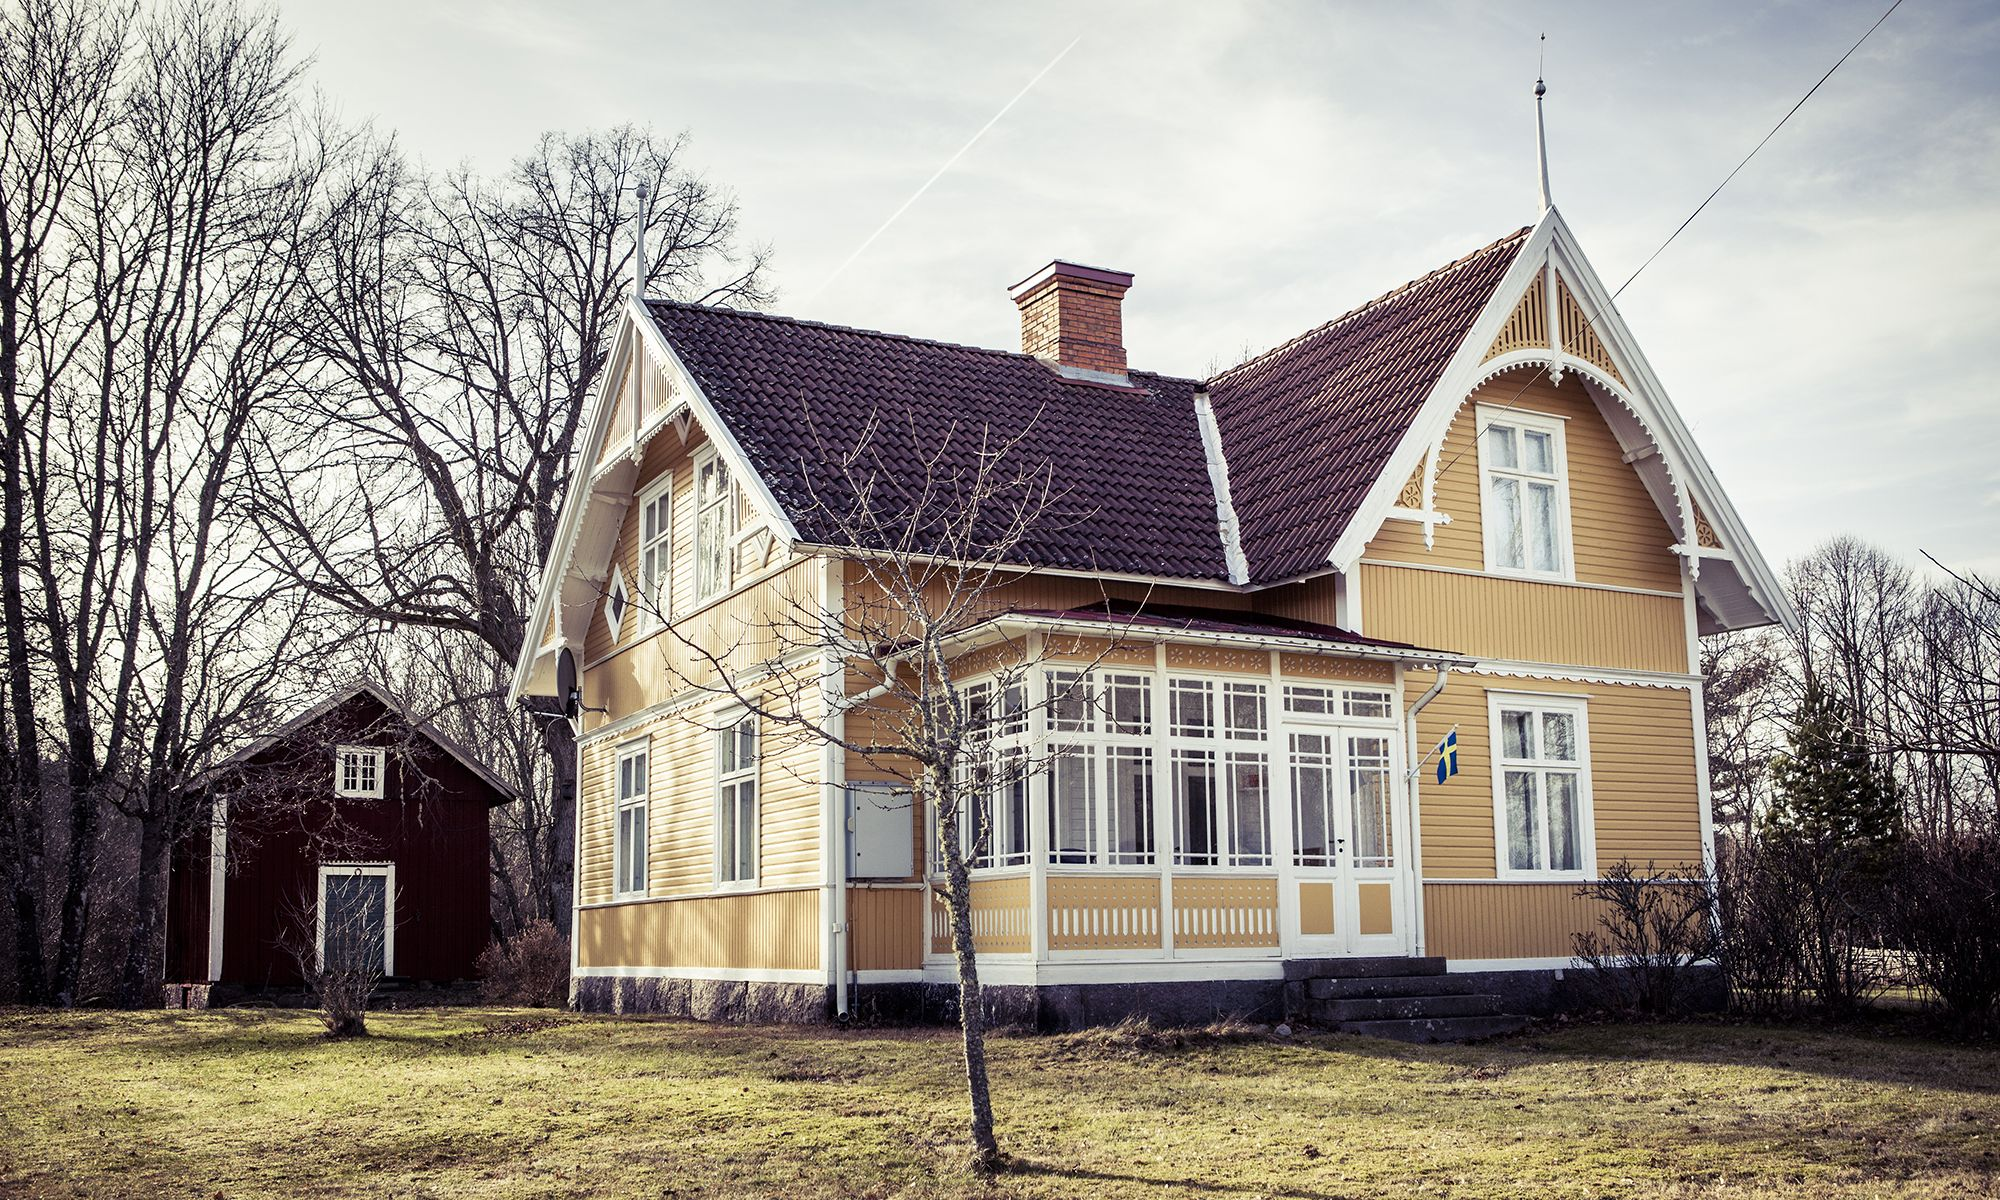 Ferienhaus in Björnhult, Småland